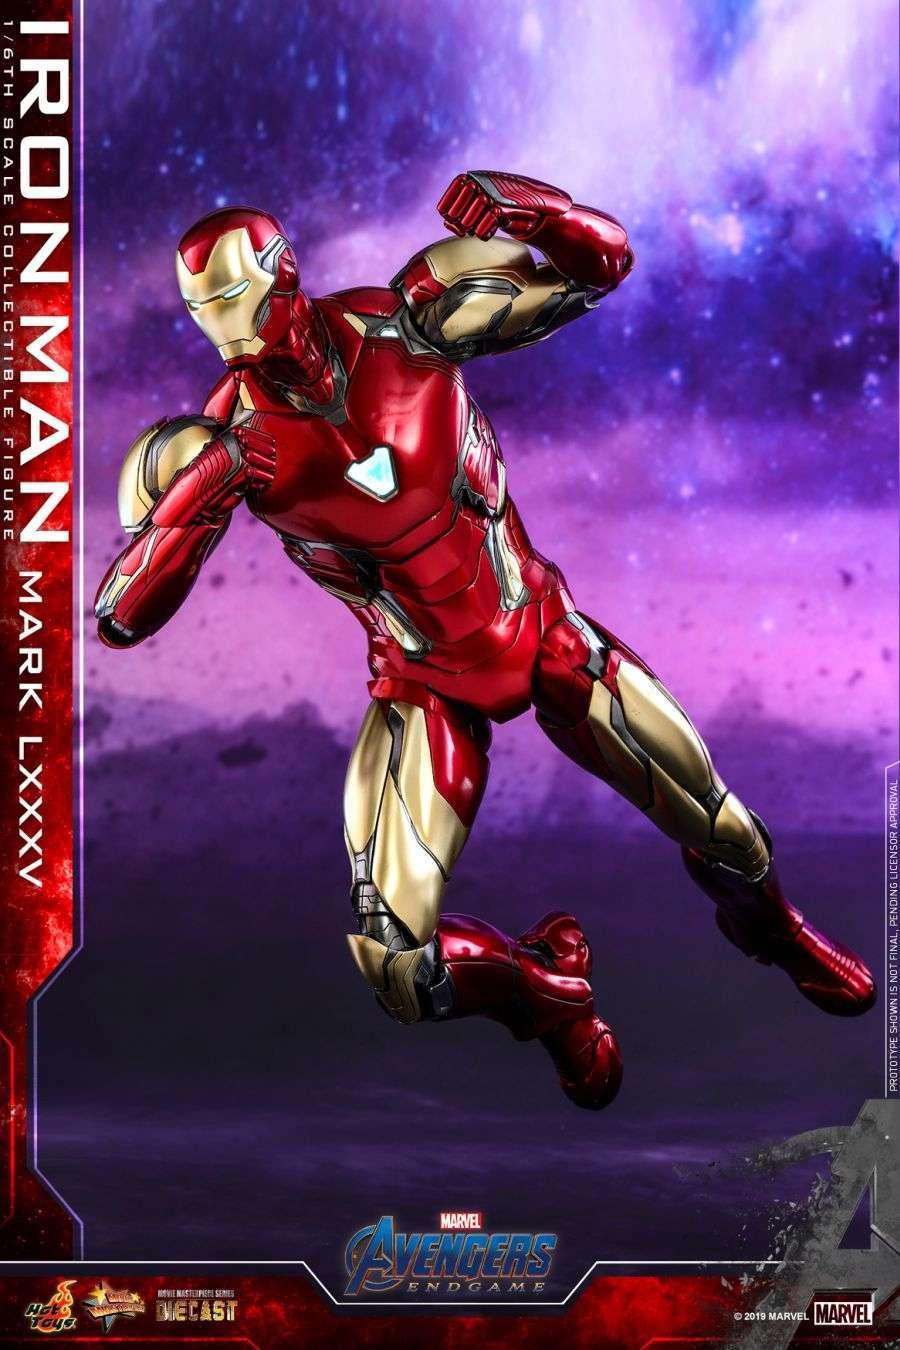 Hot Toys - Avengers 4 - Iron Man Mark LXXXV collectible figure_PR6